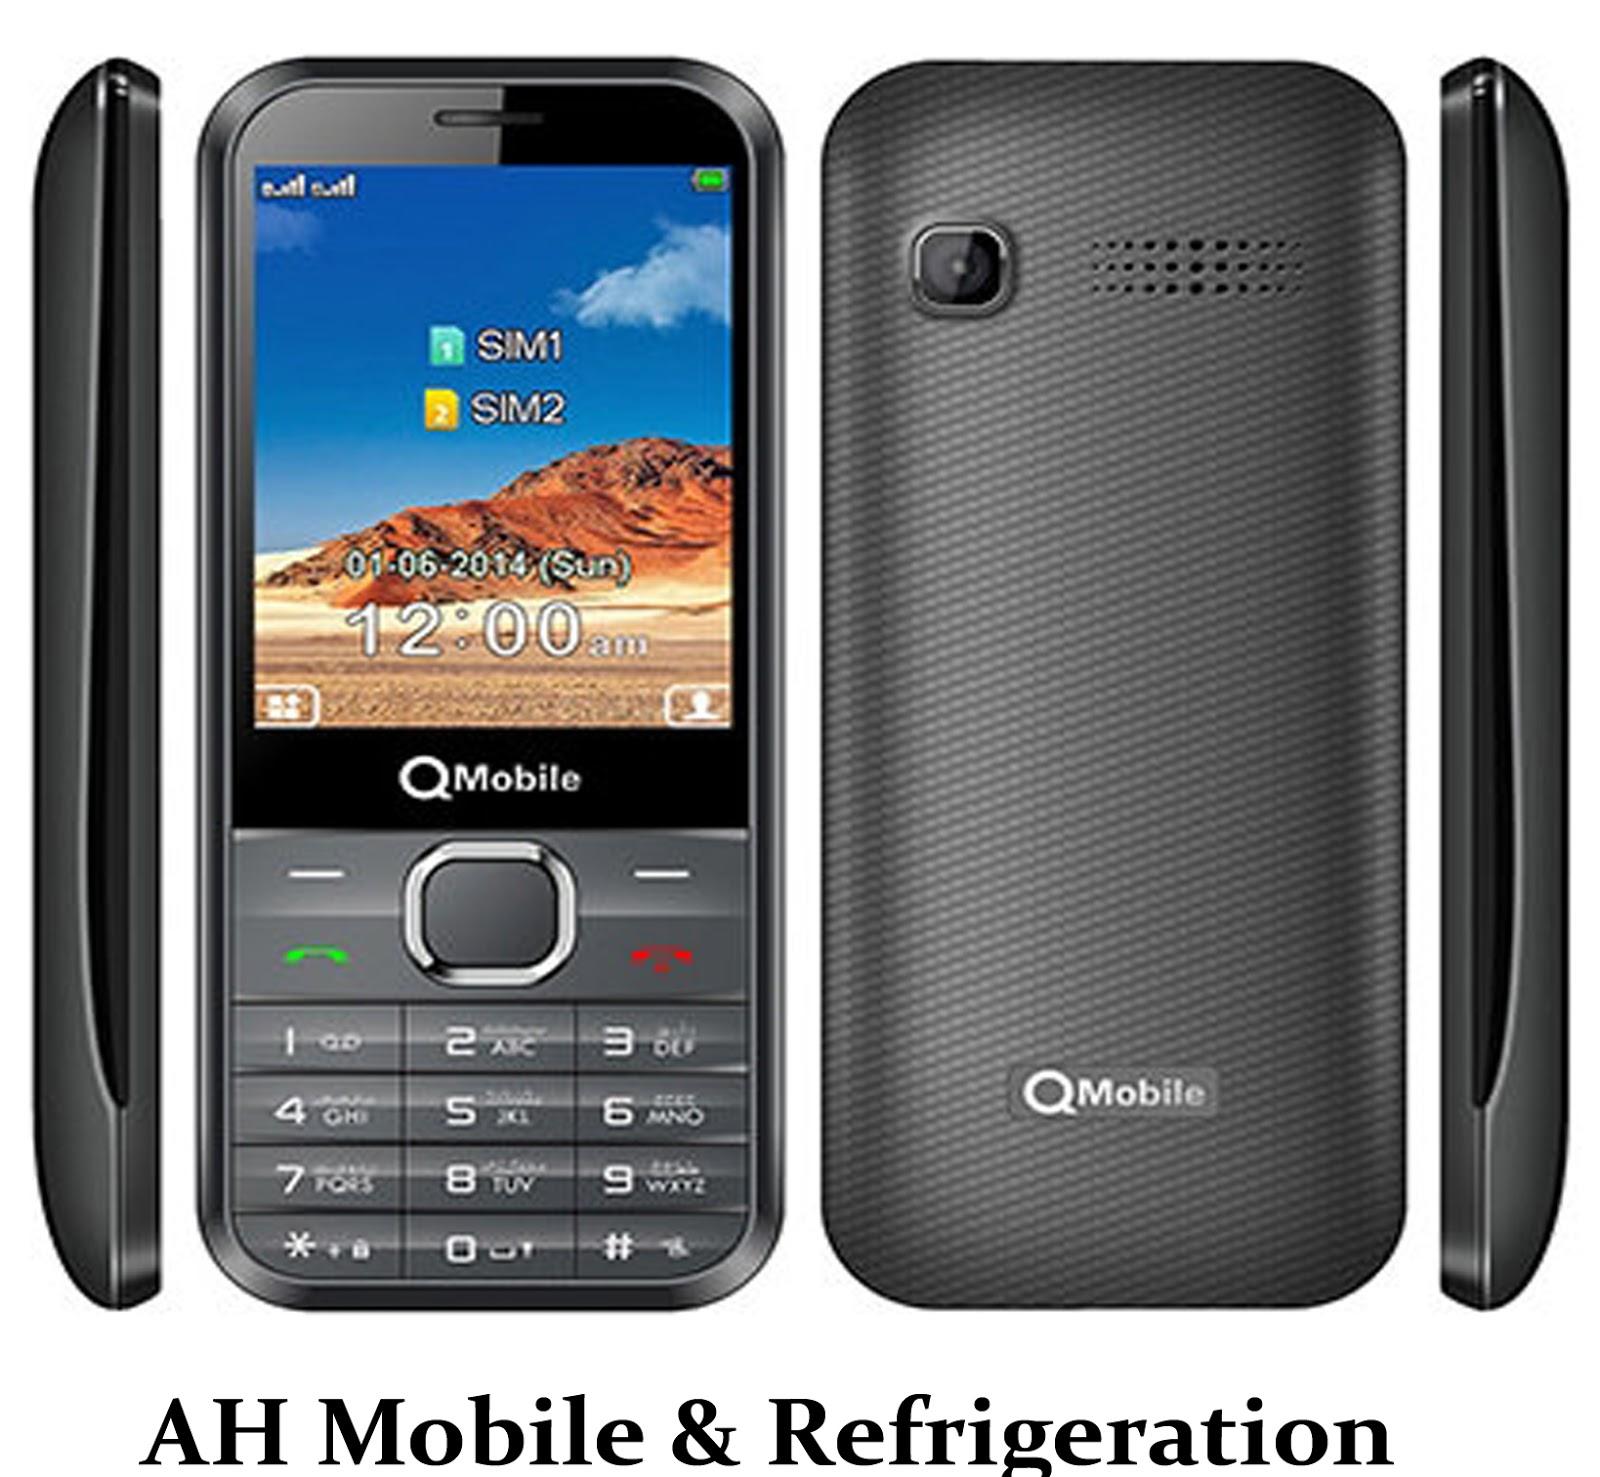 QMobile R650 MTK6261 Flash File 100% ok File - AH Mobile